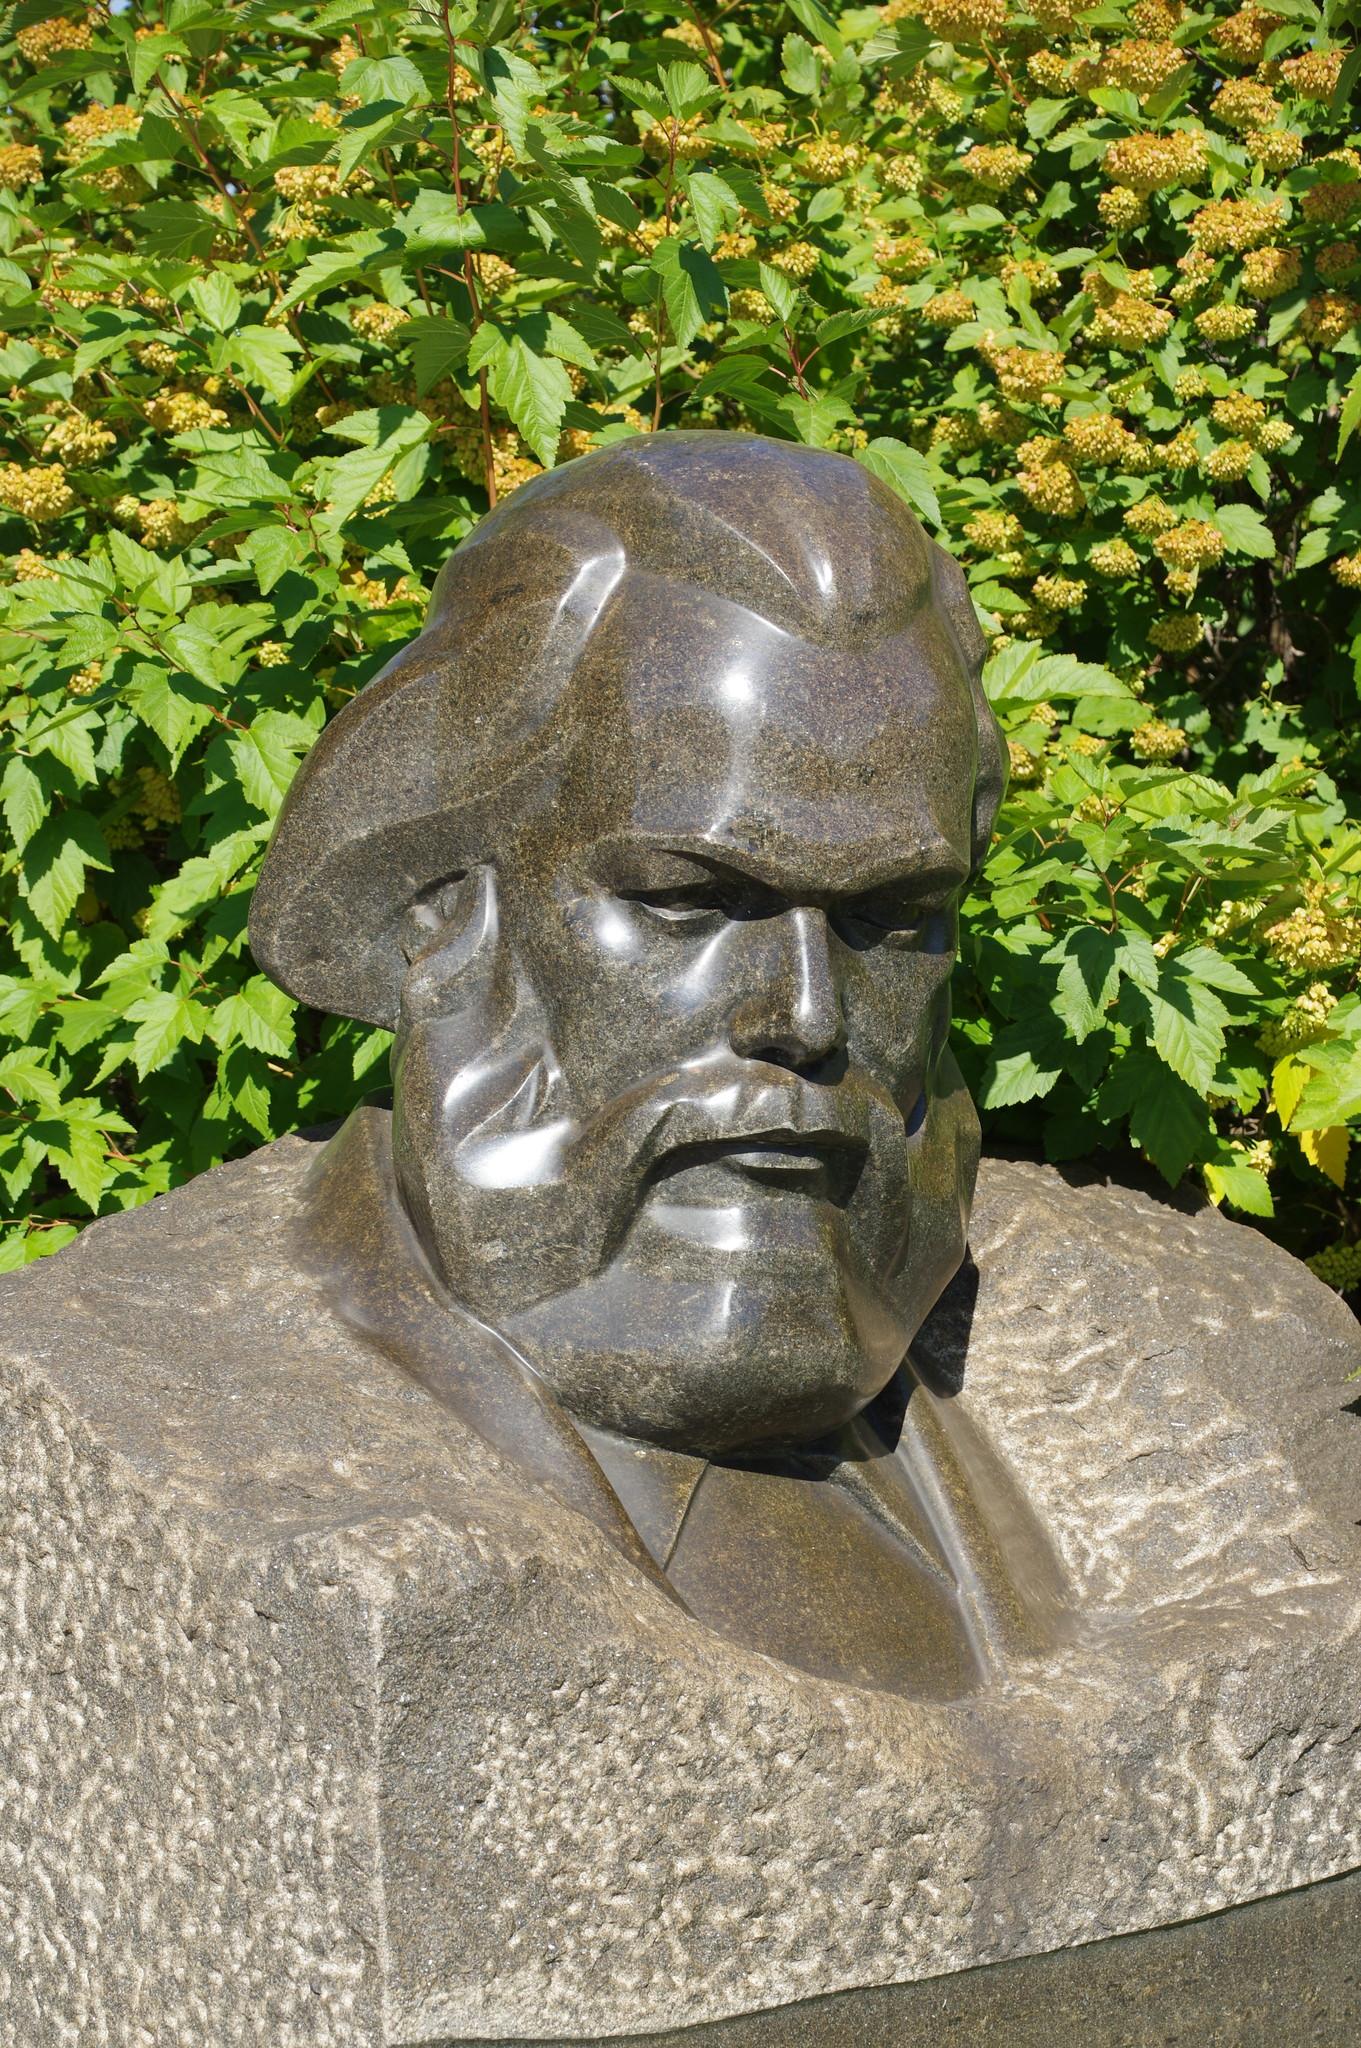 Карл Маркс. 1939 г. Гранит. Меркуров С.Д. Парк искусств «Музеон»